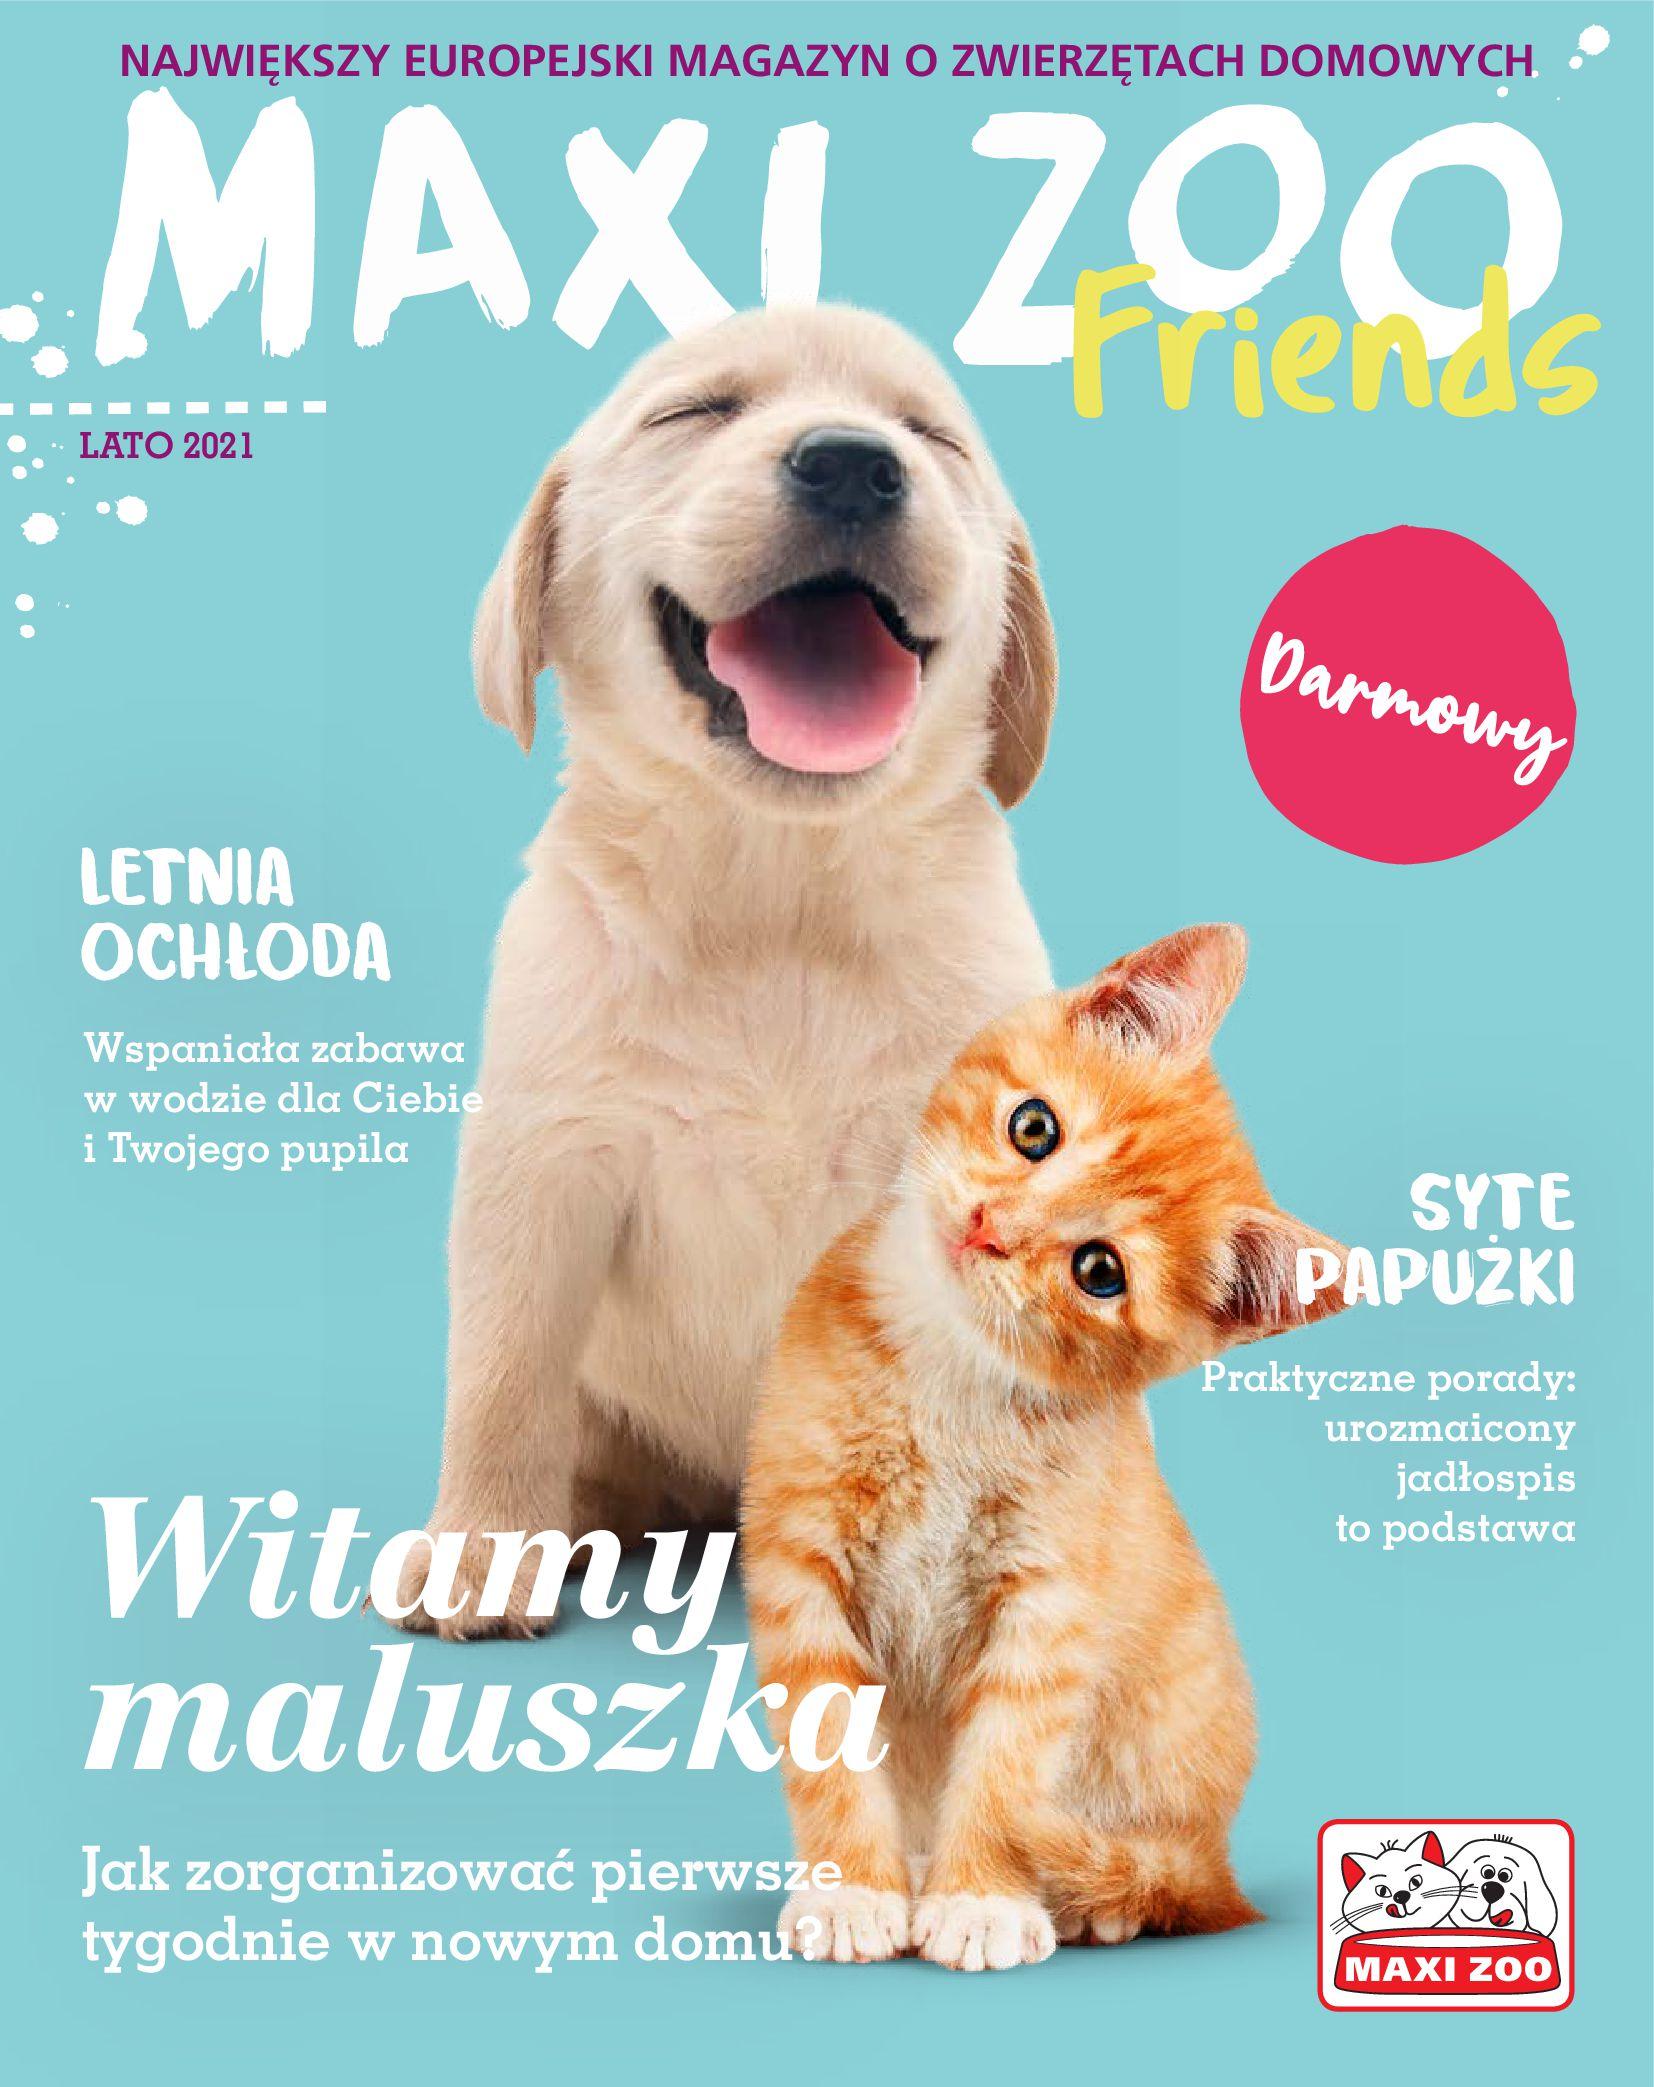 Maxi Zoo:  Gazetka Maxi Zoo 08.08.2021